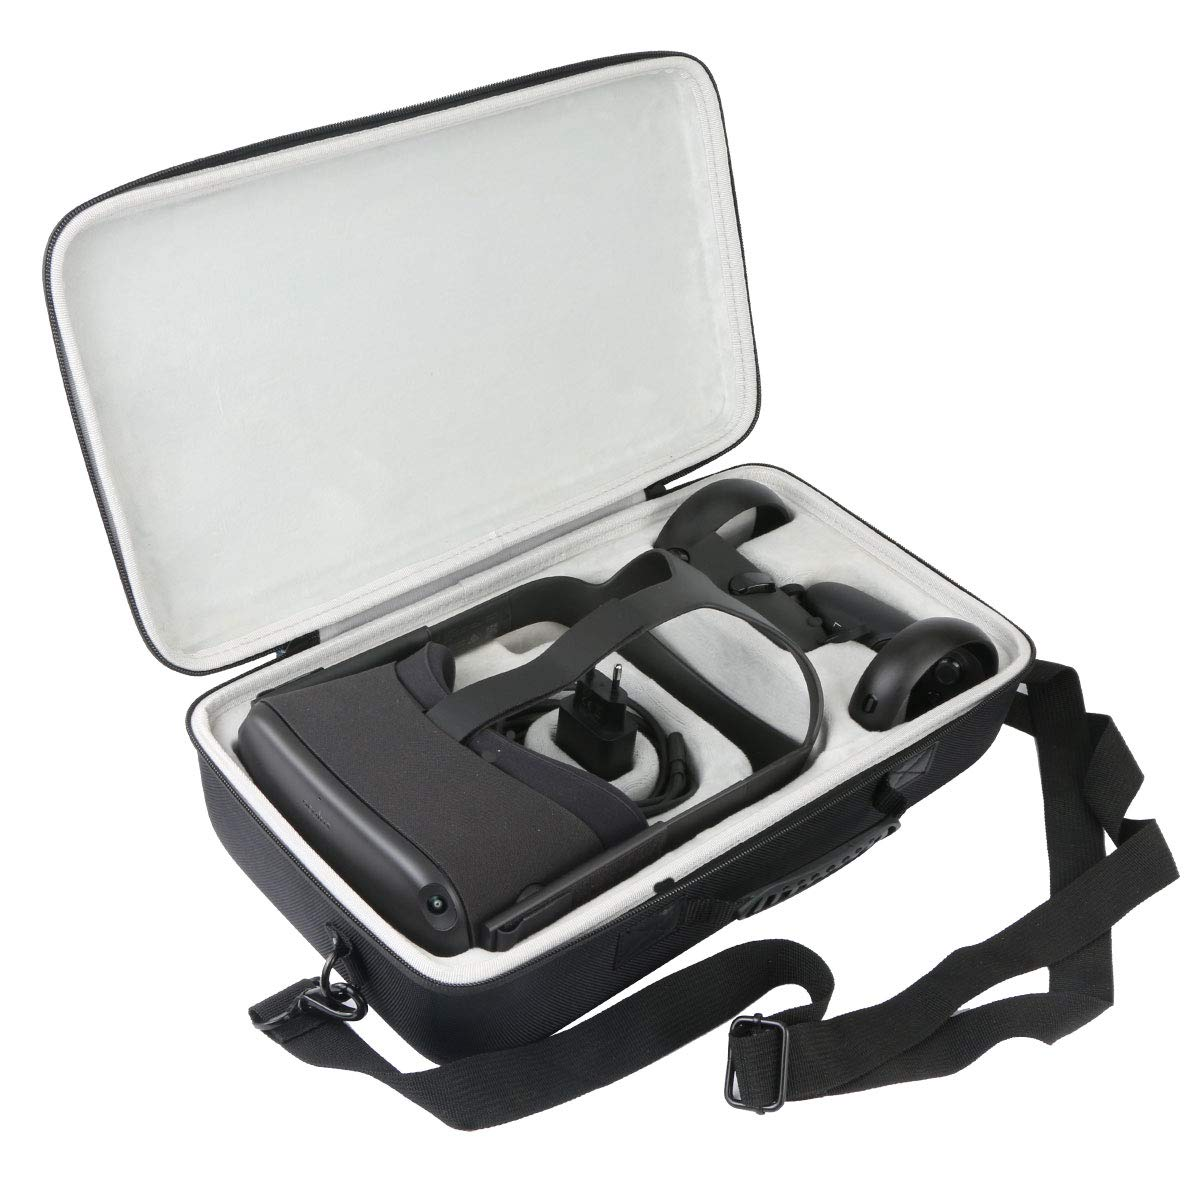 khanka Hard Travel Case for Oculus Quest 2/2020 Edition 3D VR Gaming Headset (Inside White)